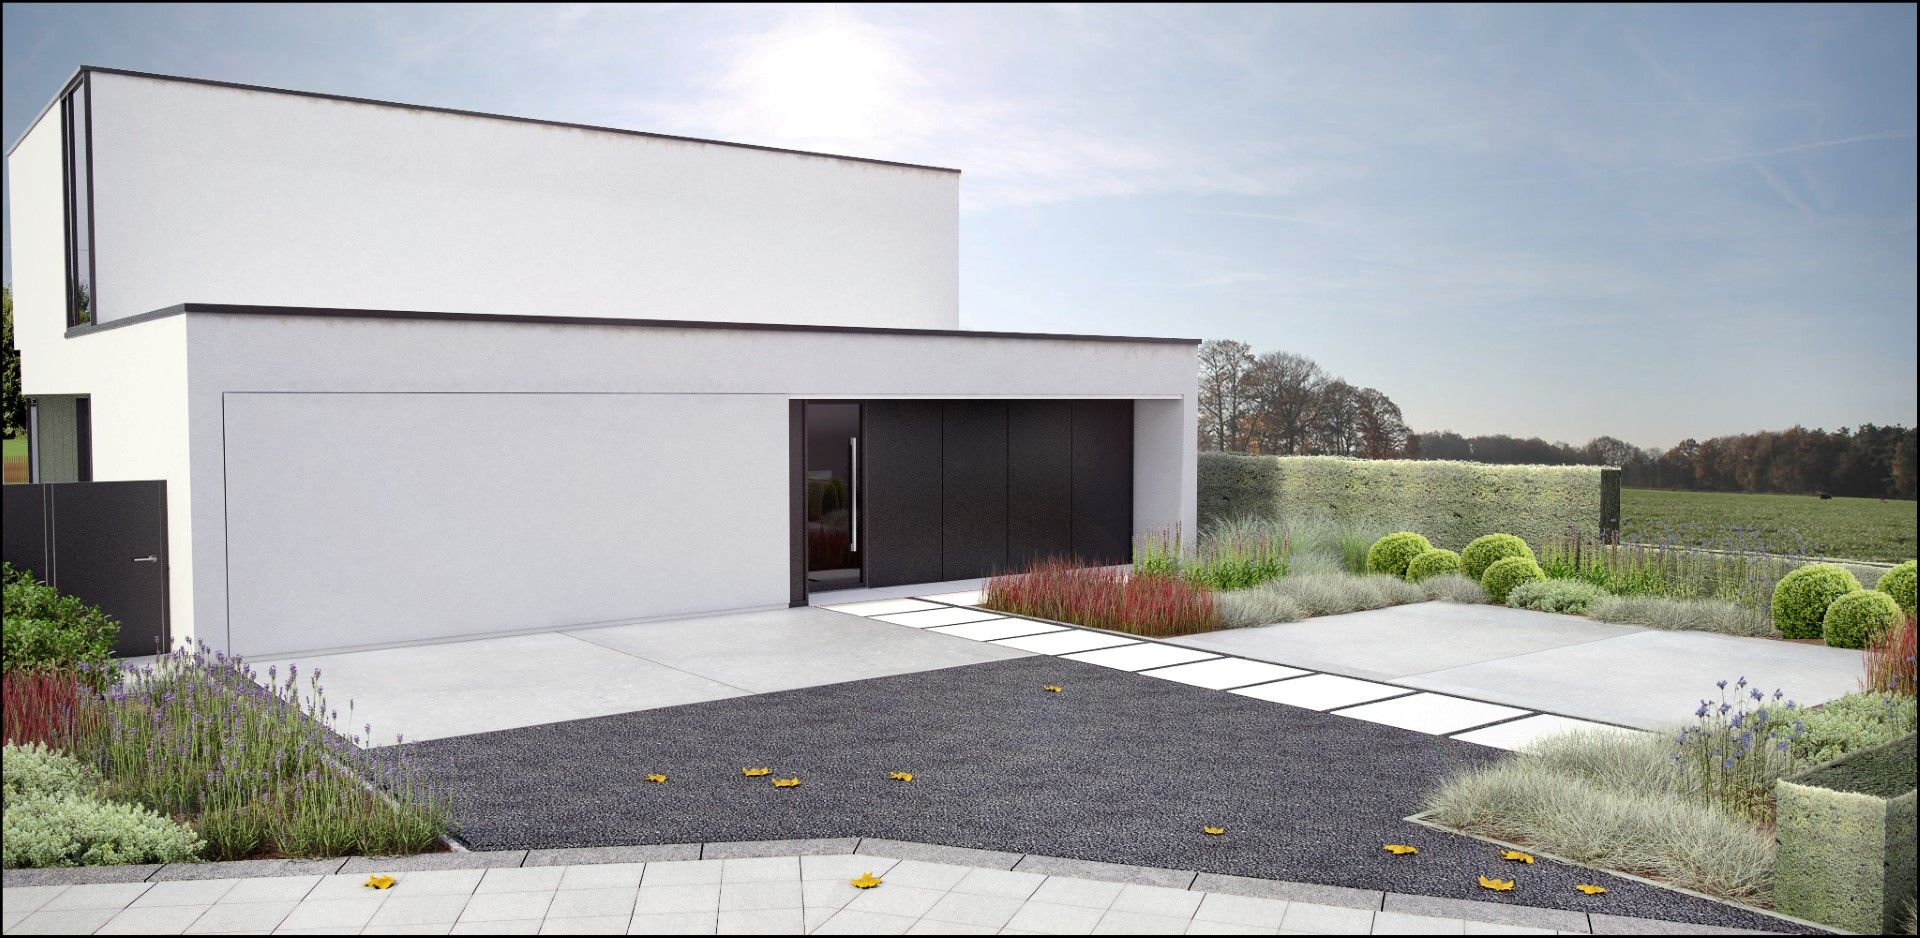 ECO Tuinarchitectengroep   3D projecten   Hedendaagse tuin Vlaams-Brabant